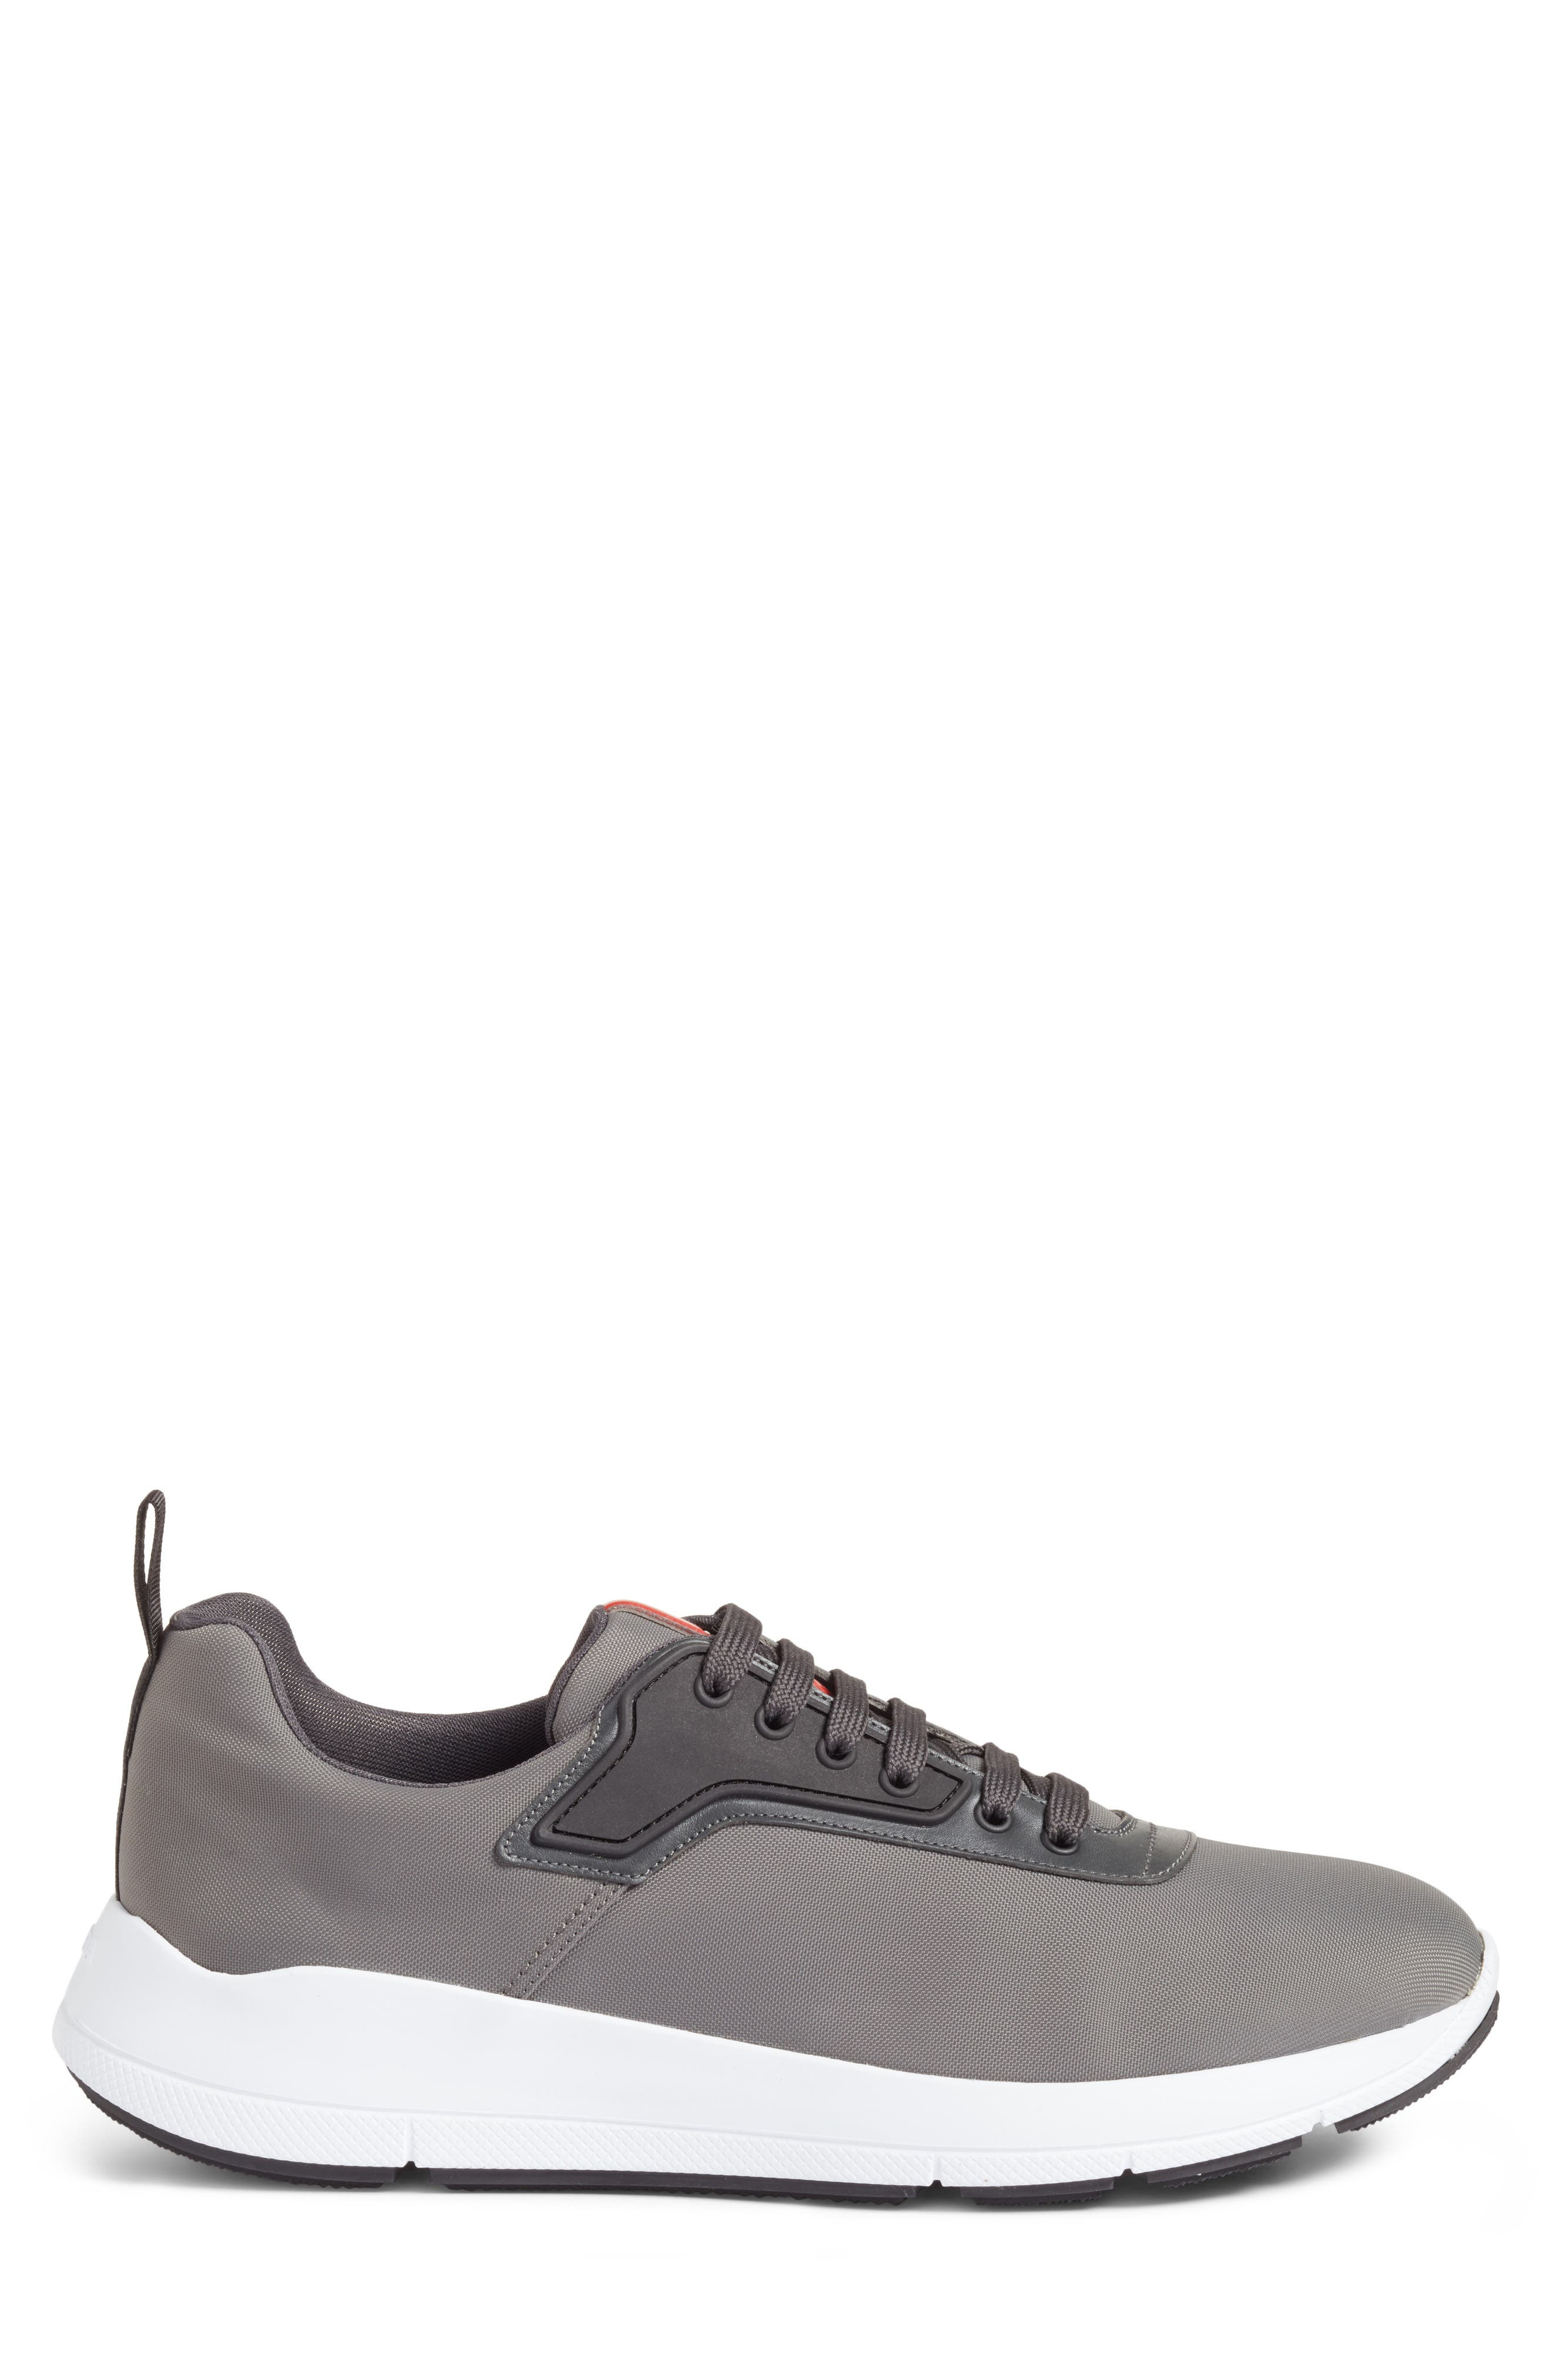 Linea Rossa Tech Sneaker,                             Alternate thumbnail 3, color,                             253